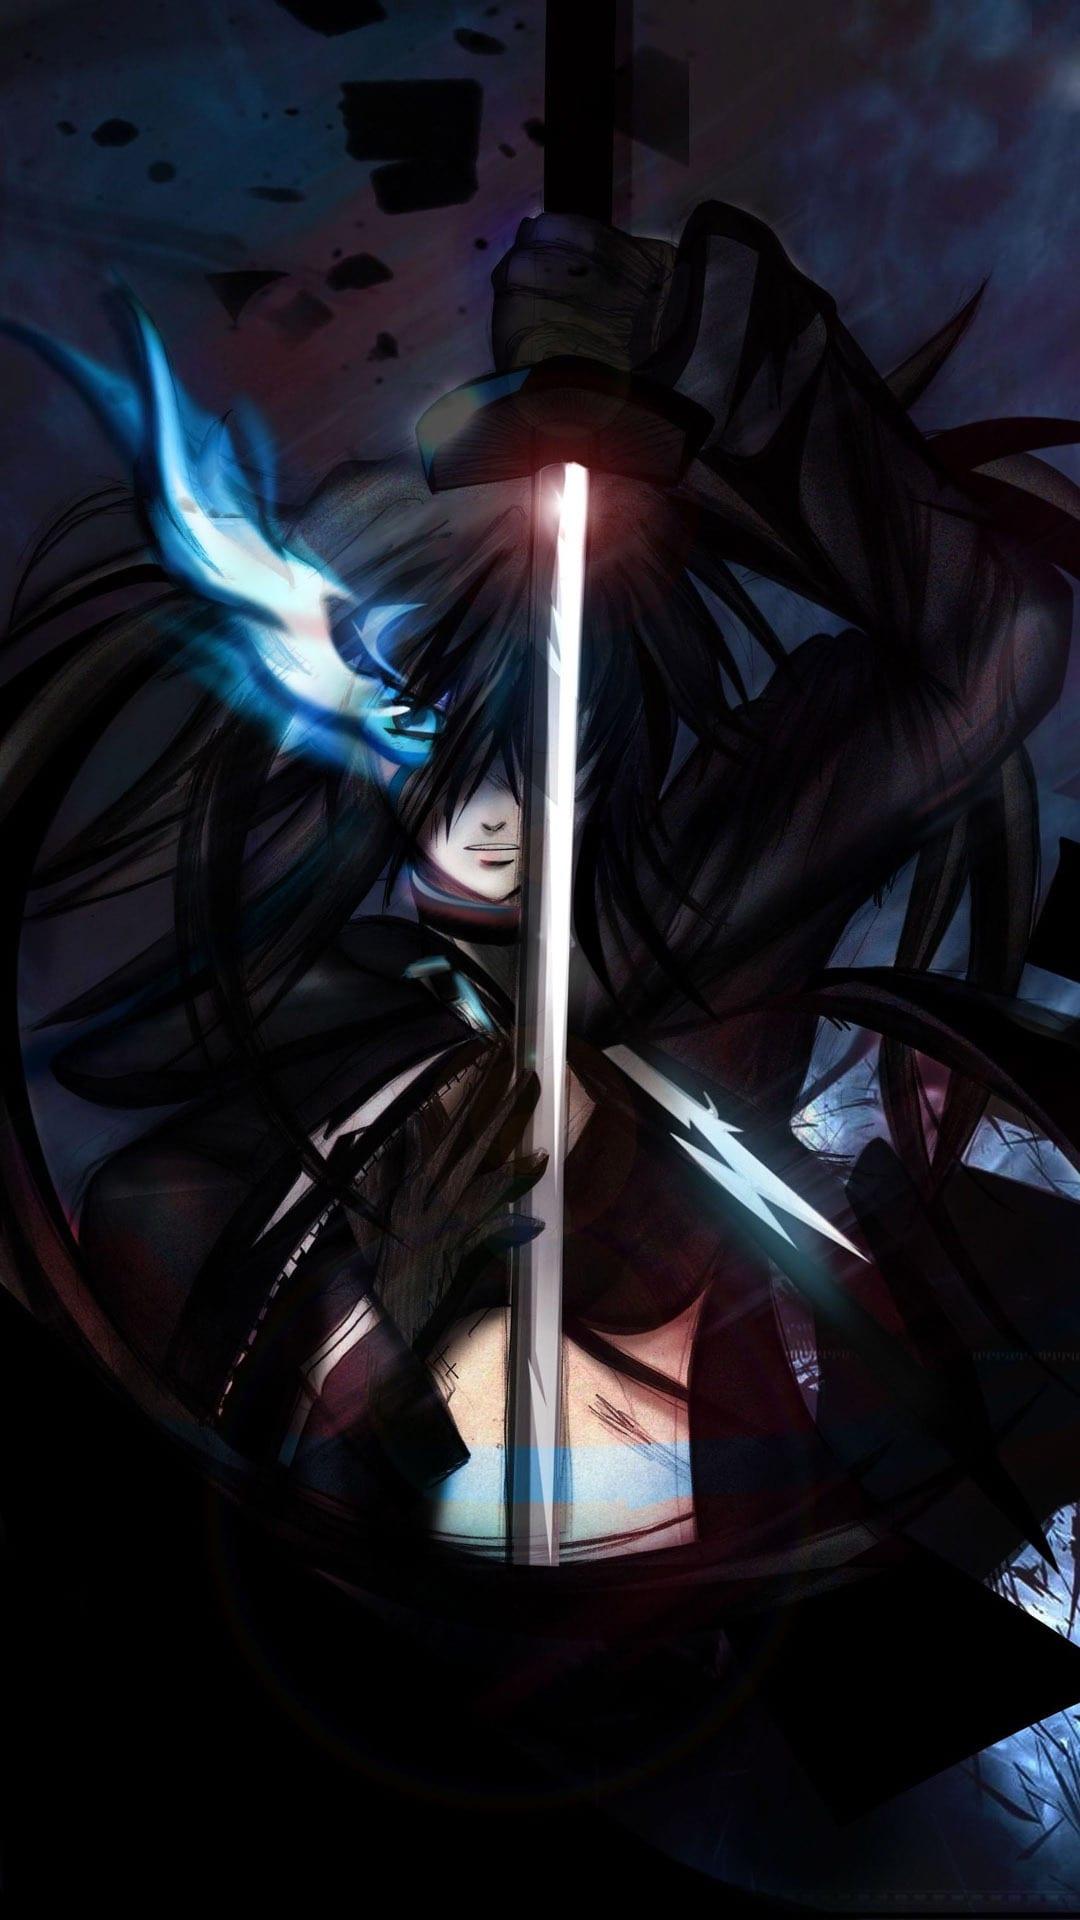 Fondos de pantalla otaku para celular